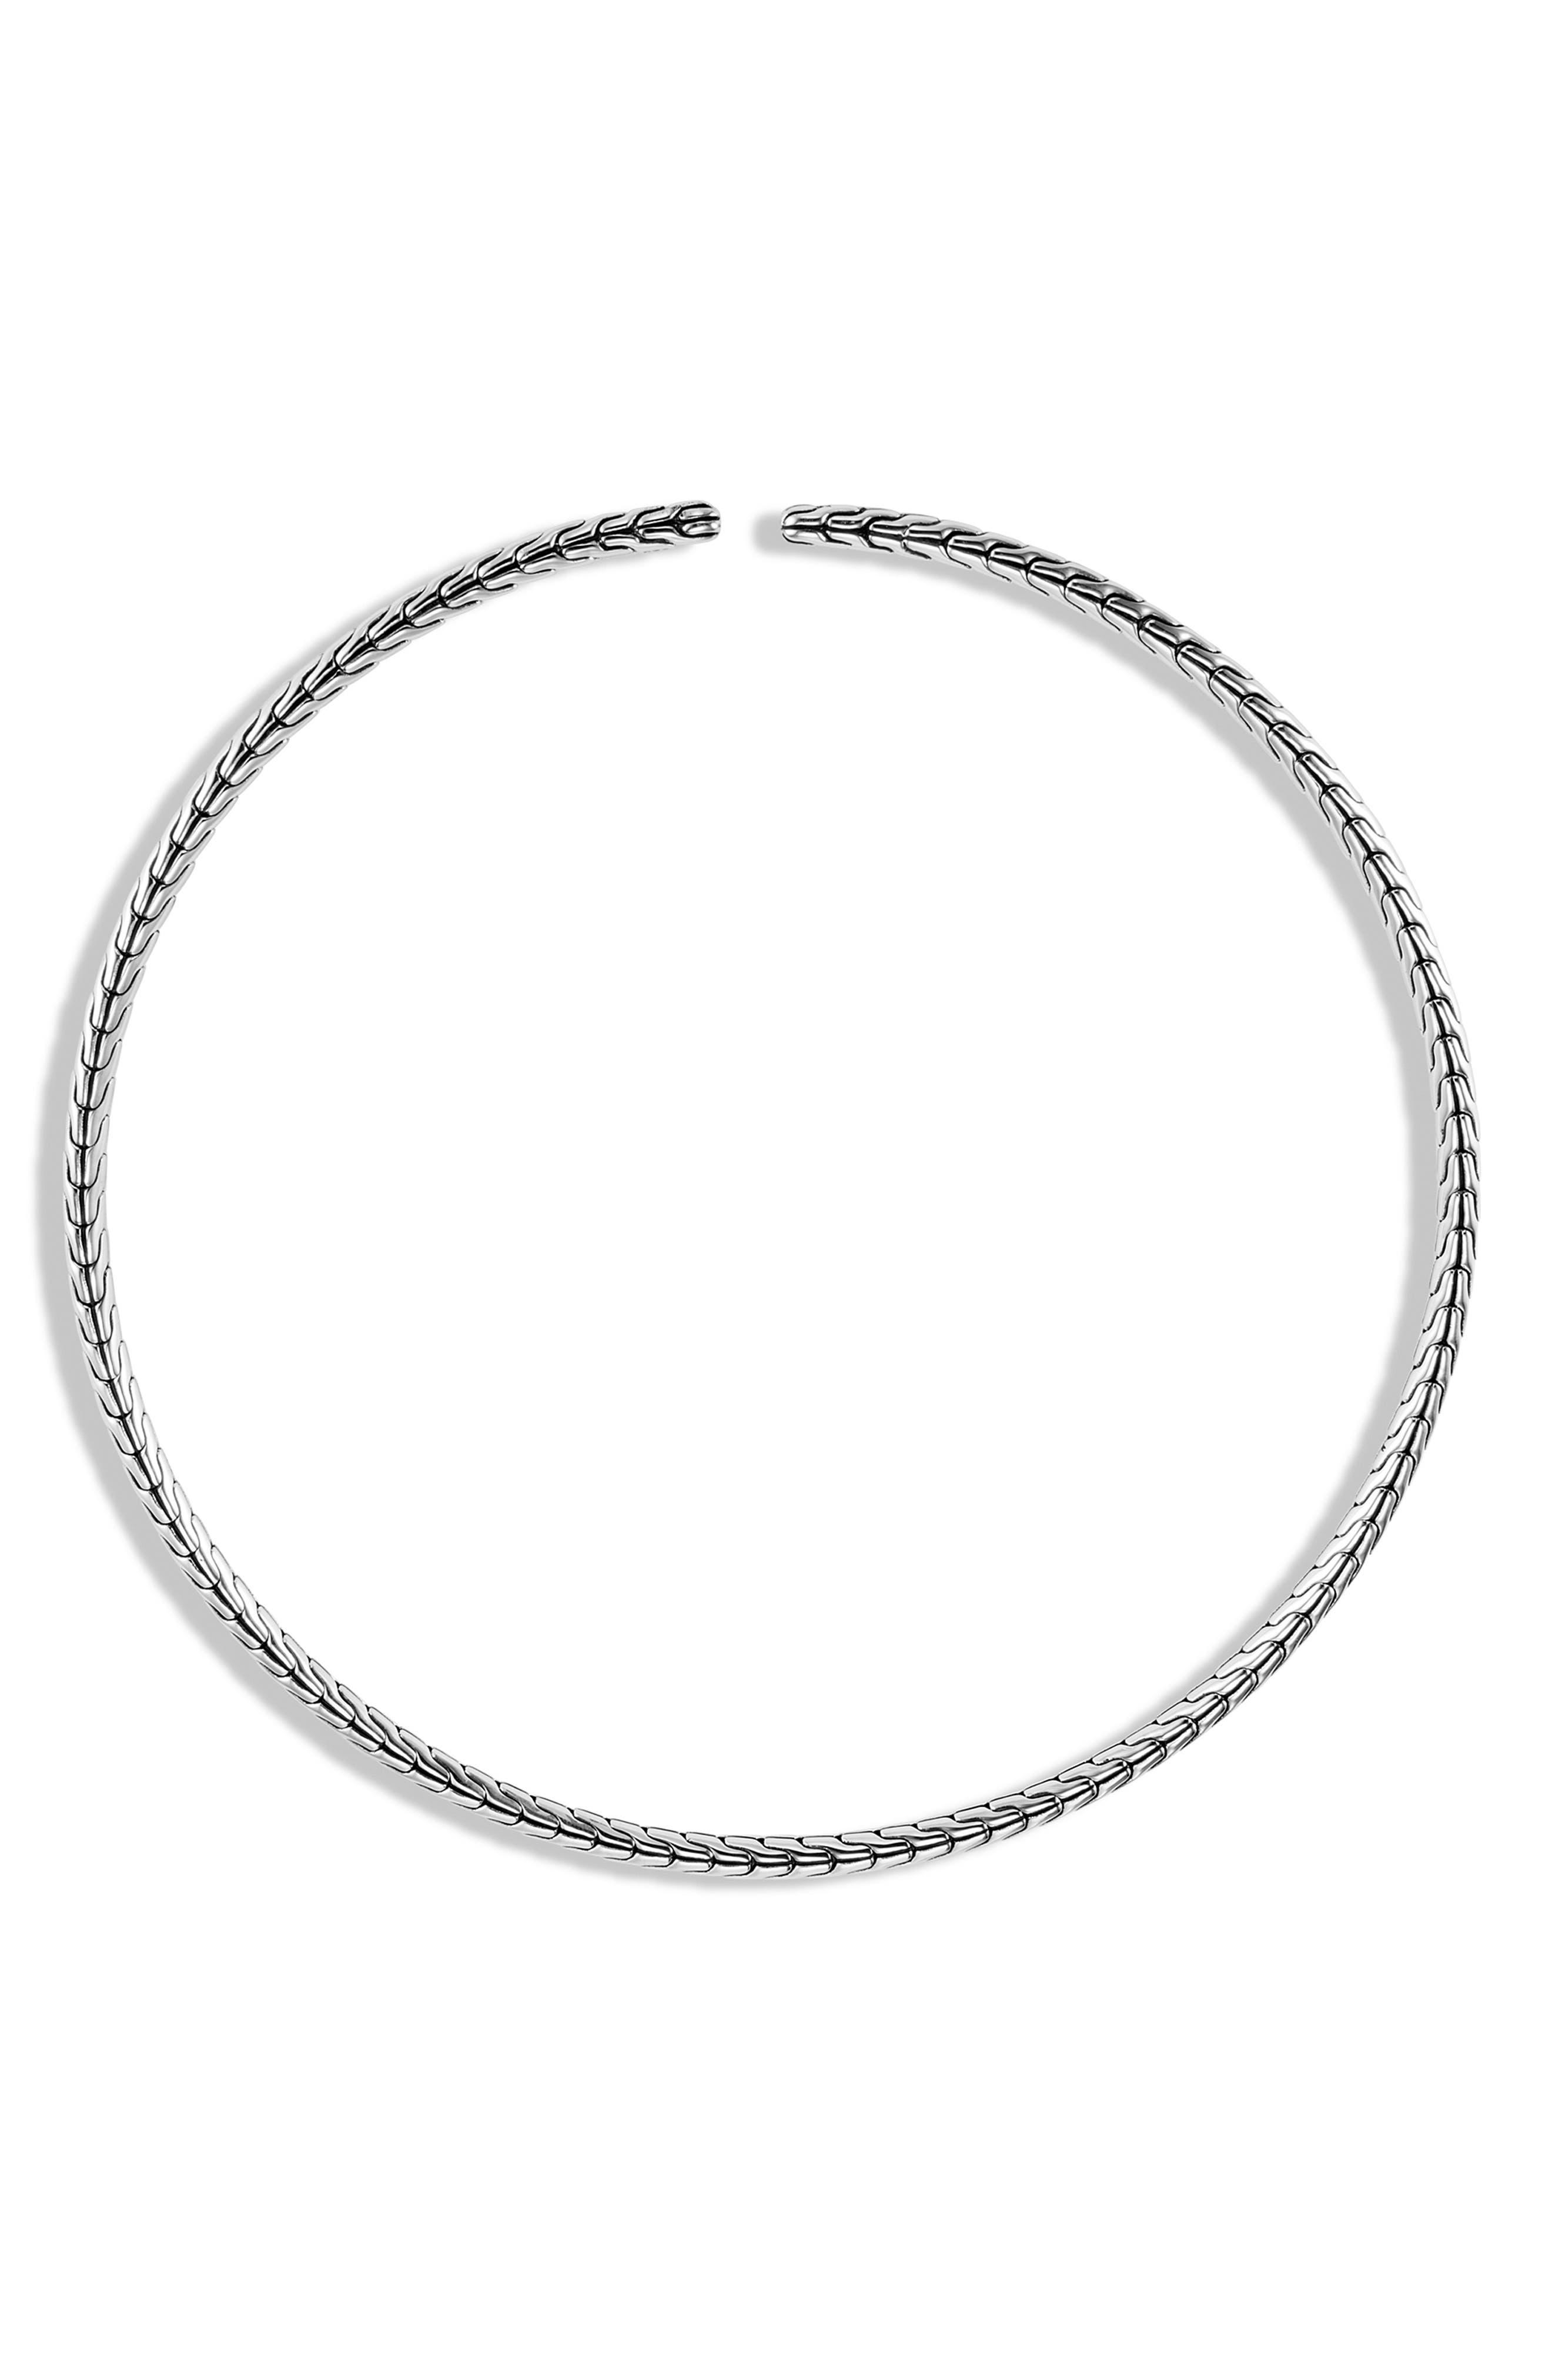 Classic Chain Silver Coil Choker Necklace